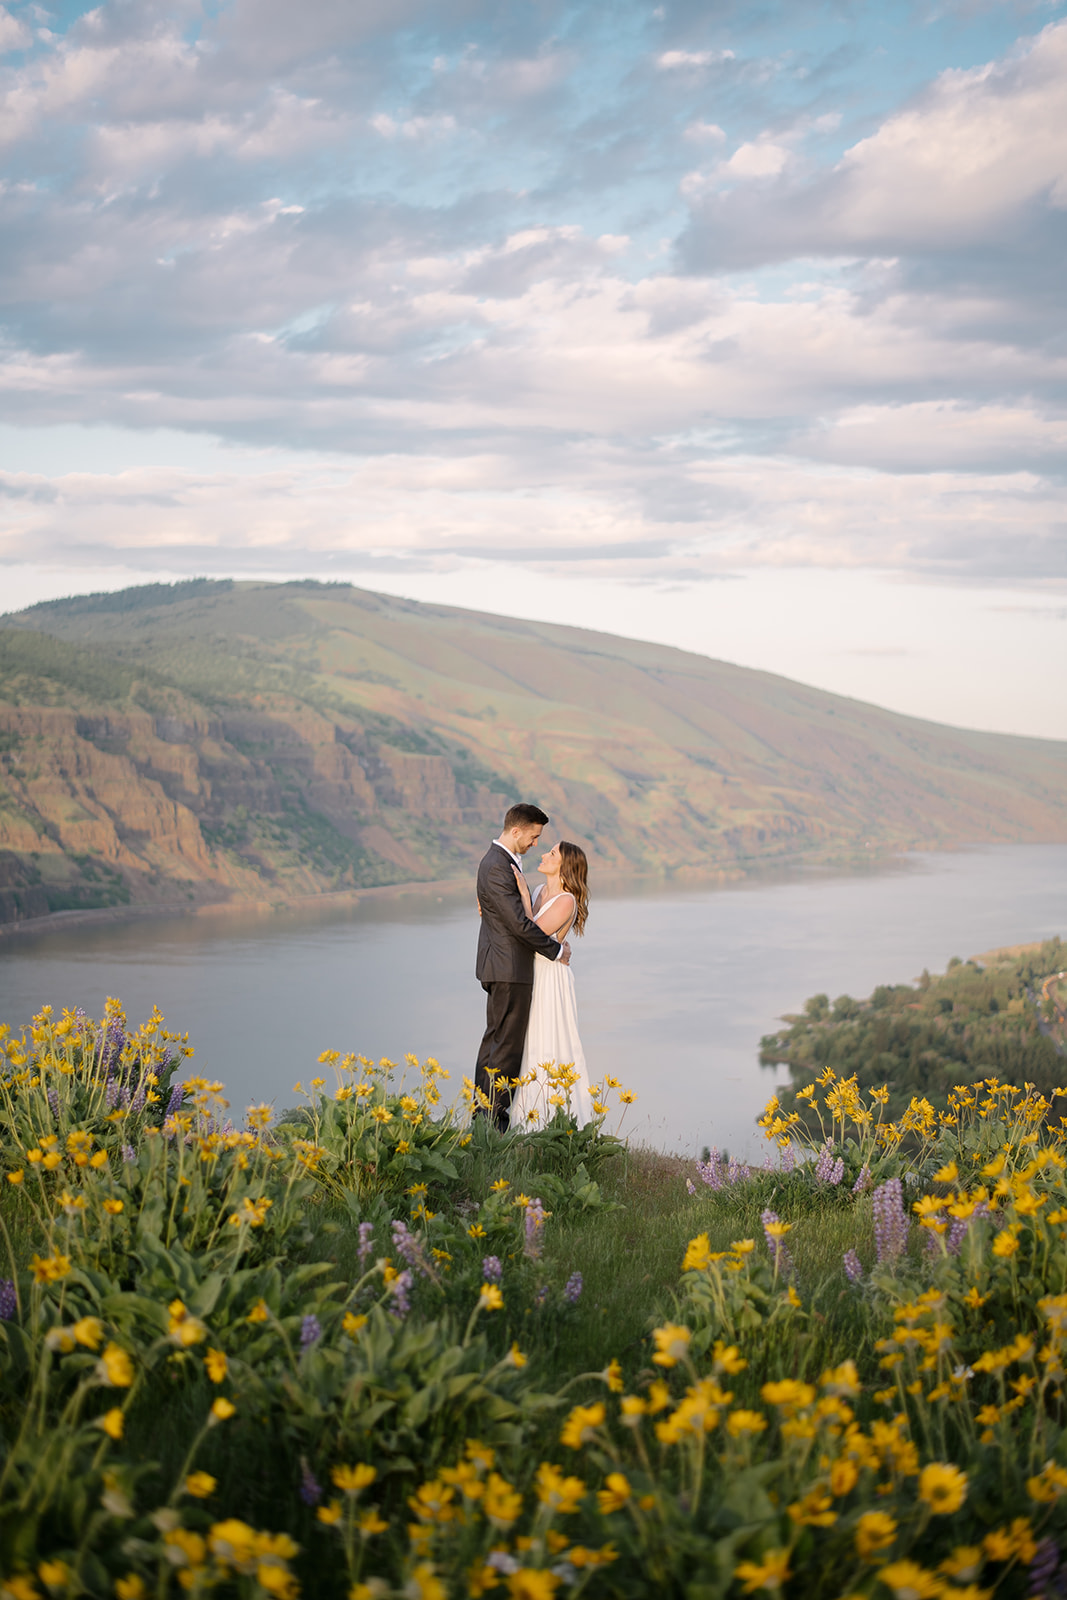 kamea_events_wedding_planner_portland_DeusAmor77.jpg